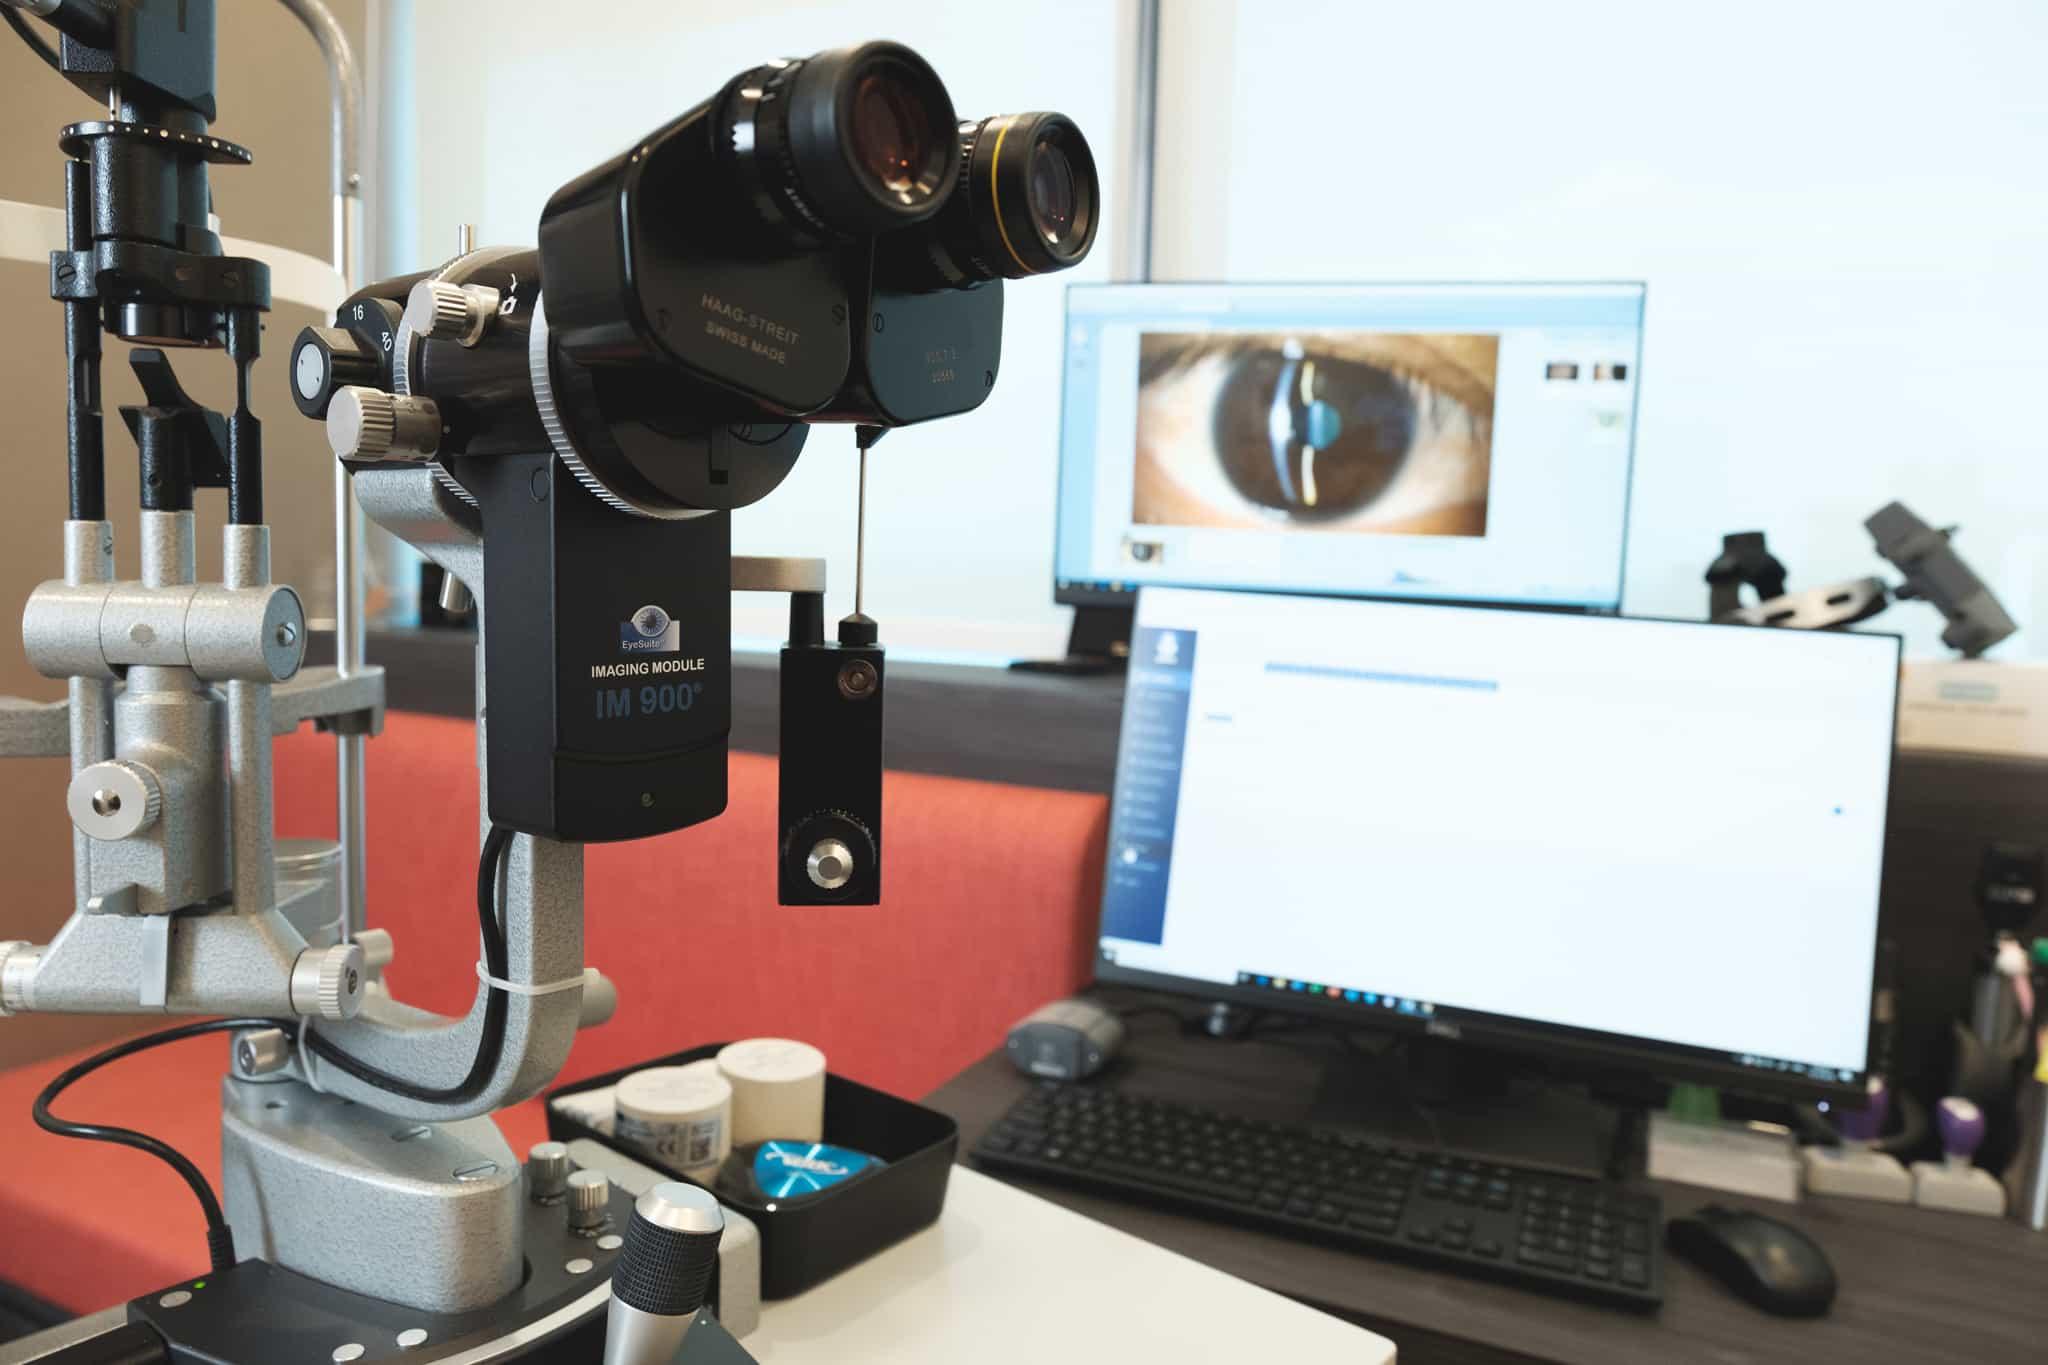 Instruments of Ava Eye Clinic